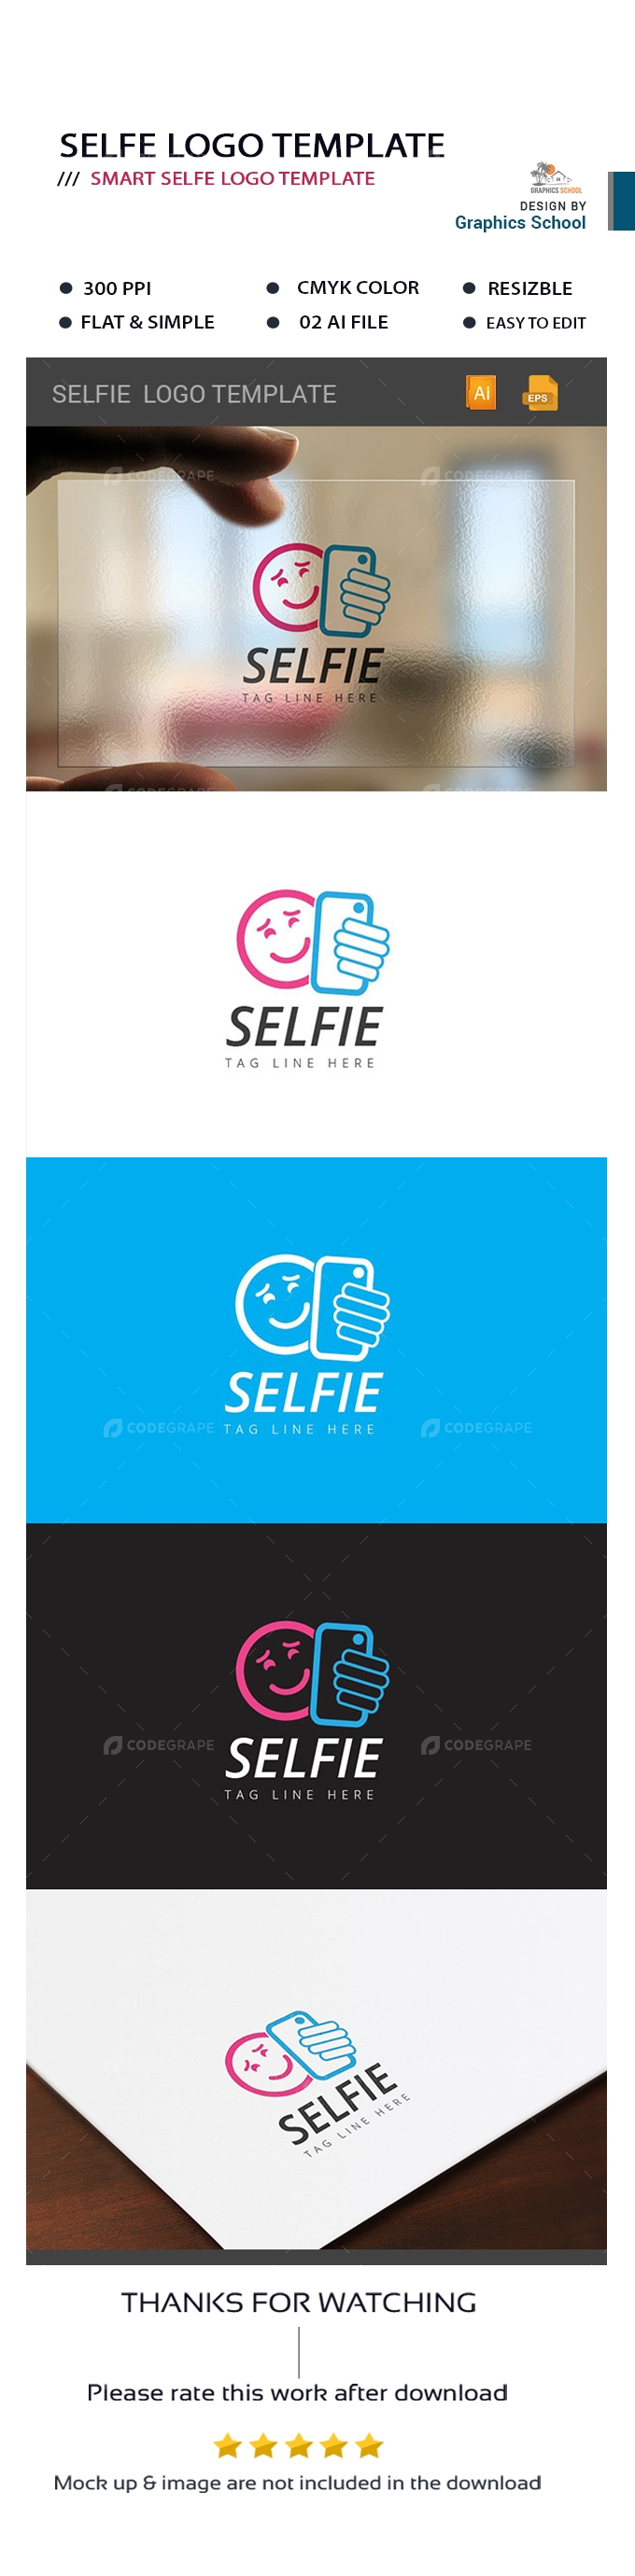 Selfie Logo Template